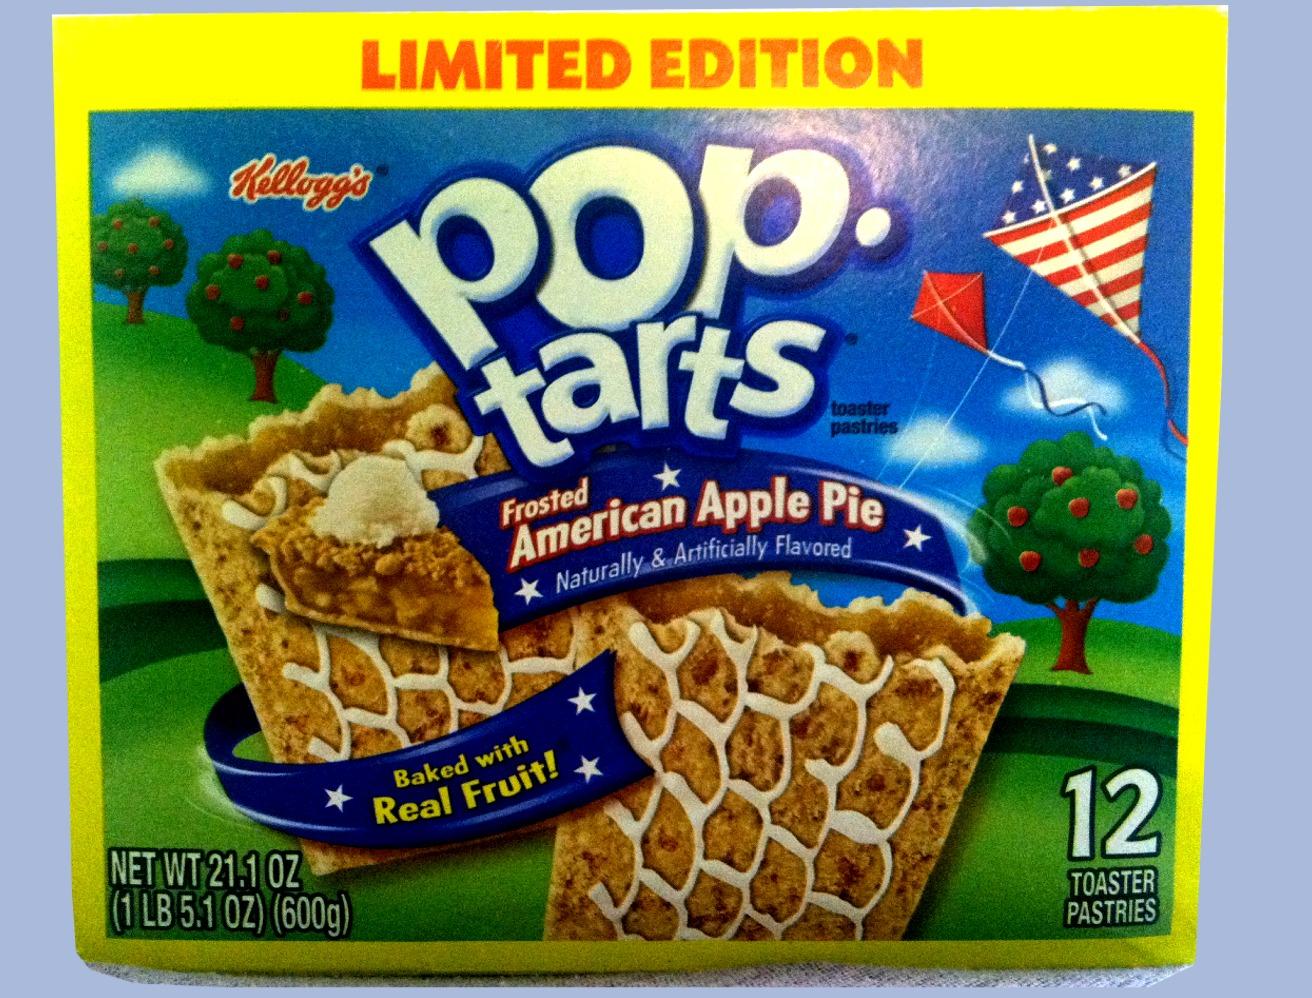 The Holidaze: Apple Pie Pop Tarts